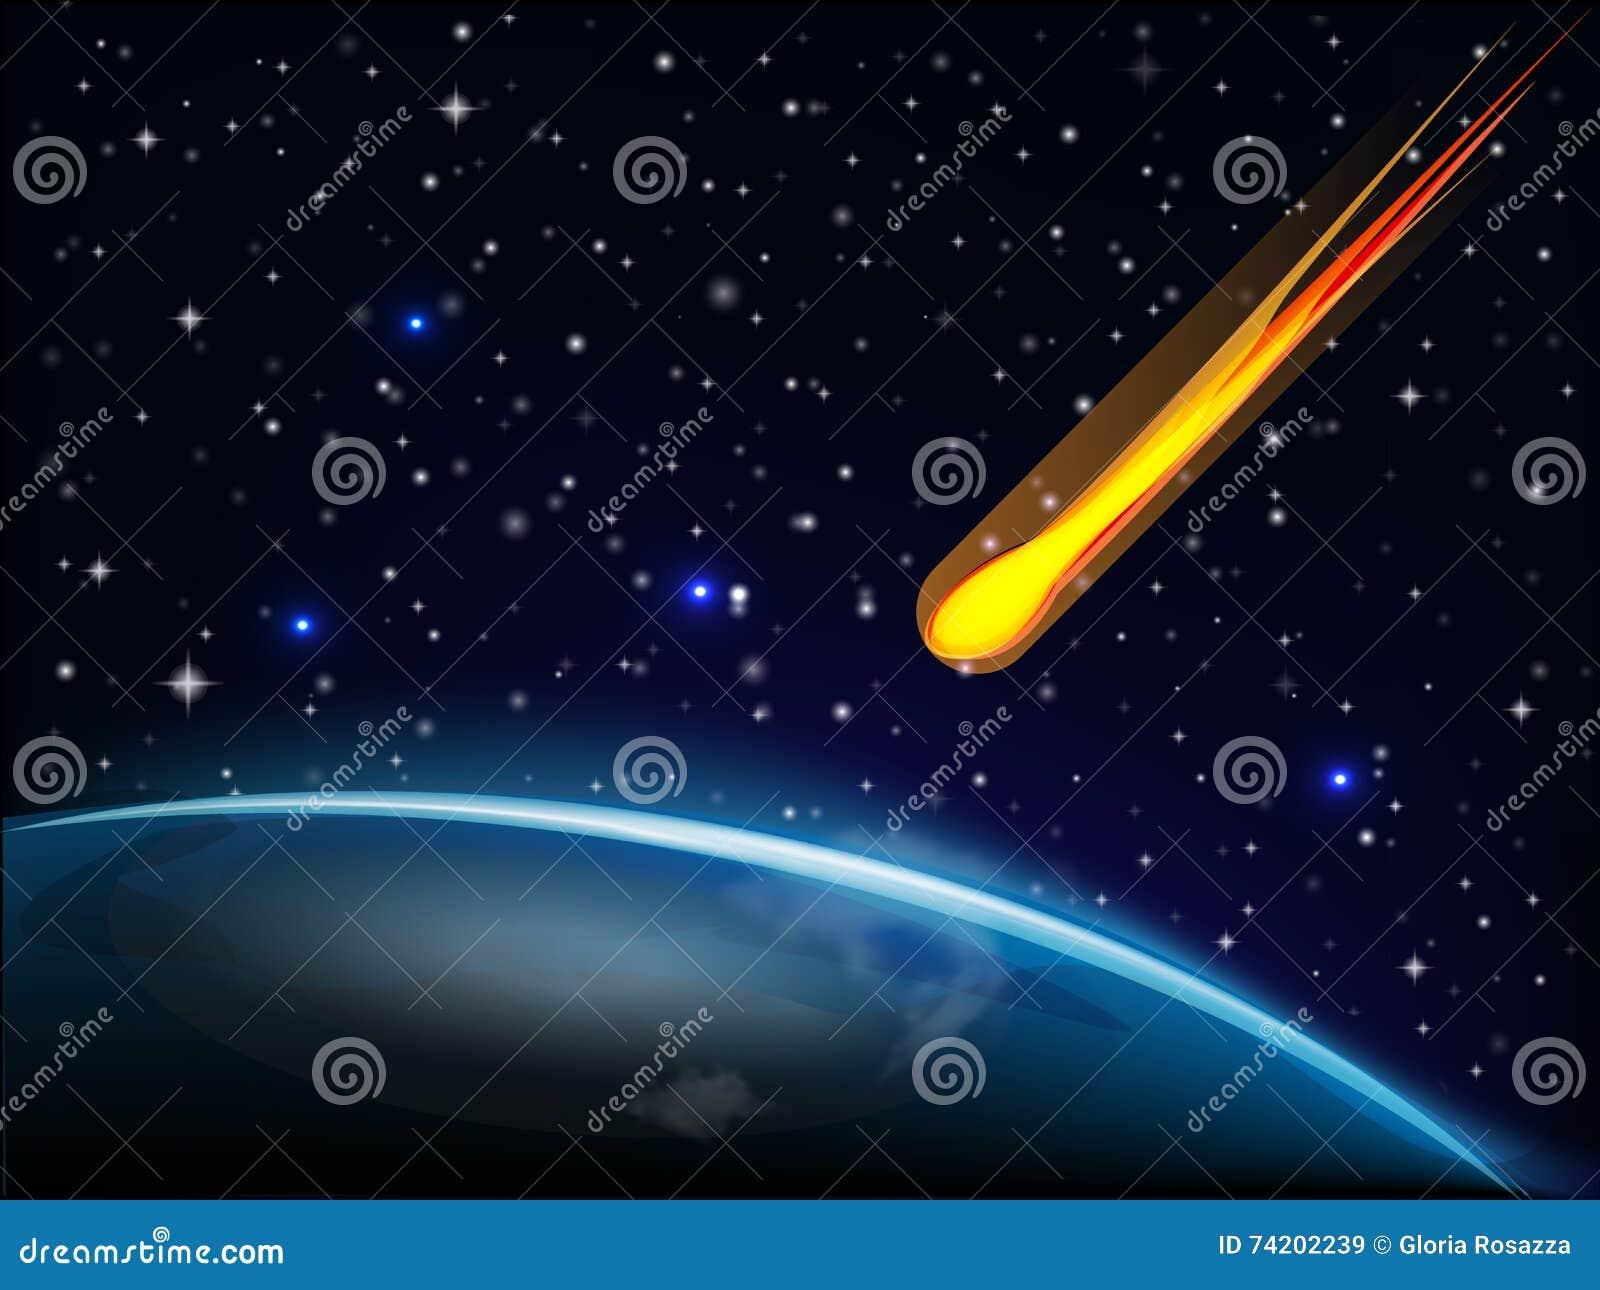 fireball falling on earth stock vector illustration of burning